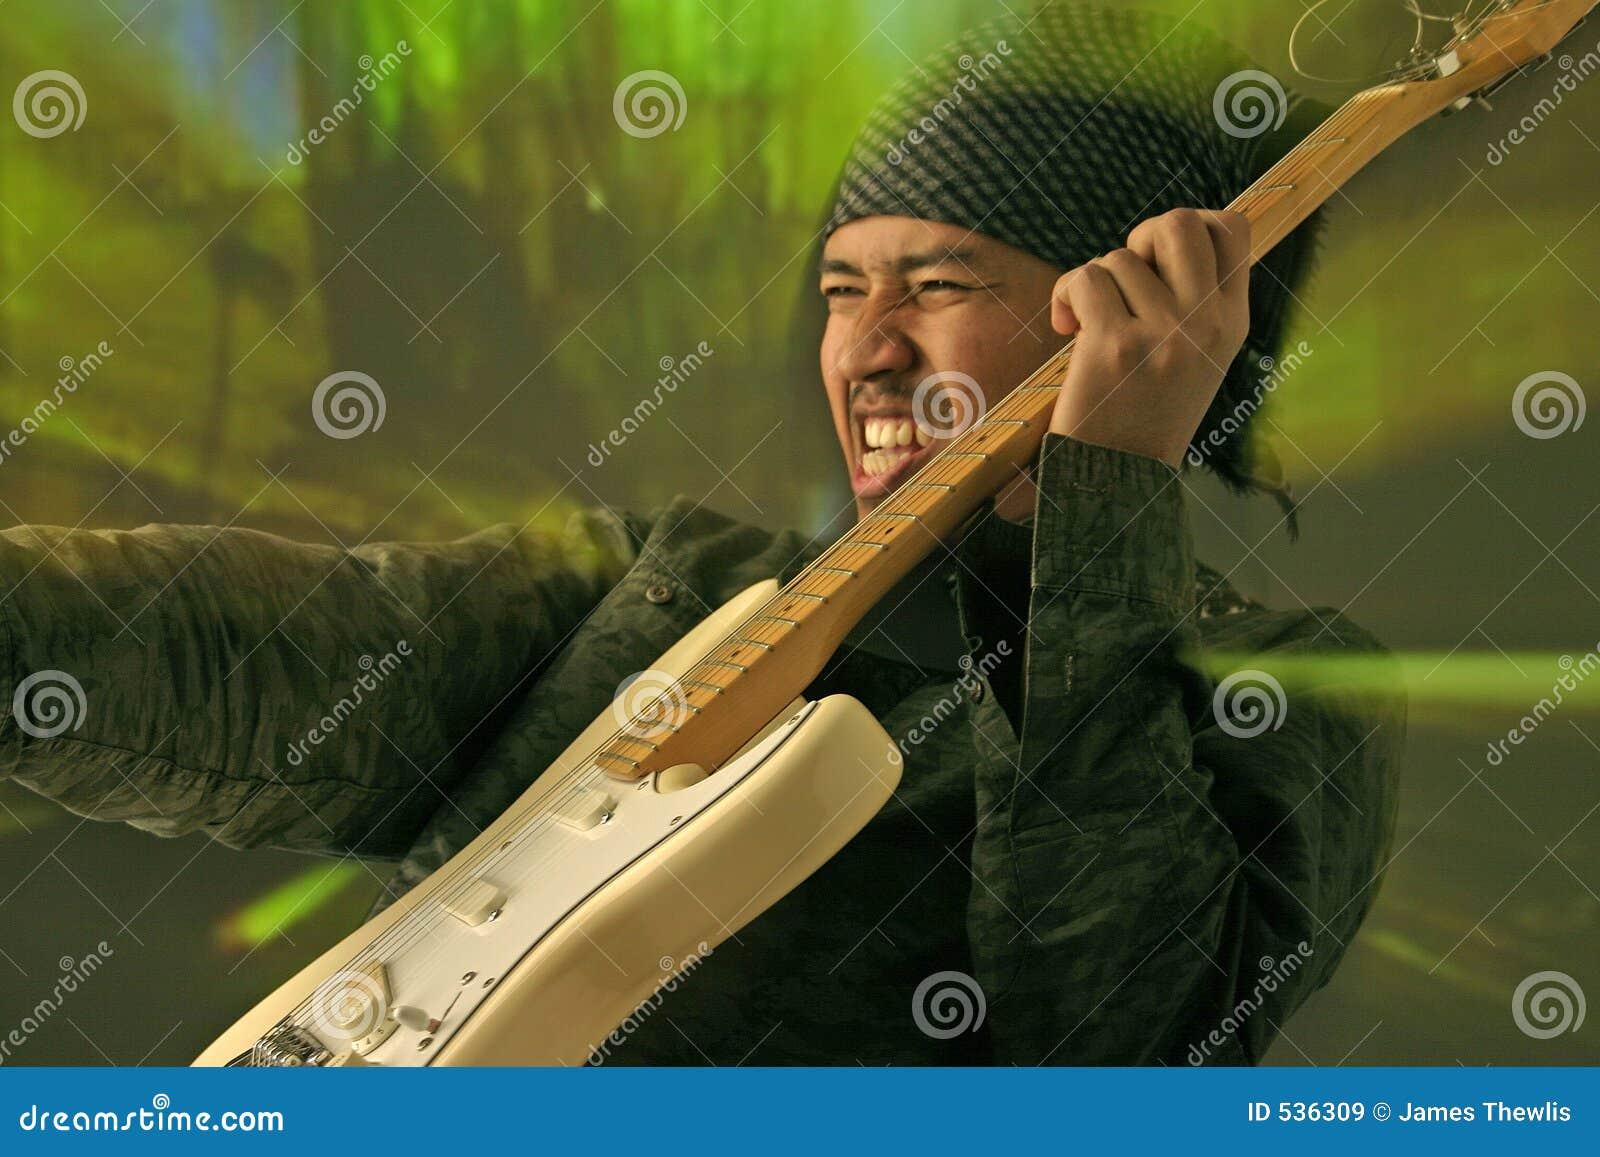 Download 吉他演奏员 库存图片. 图片 包括有 晒裂, 仪器, 爵士乐, 流行音乐, 电子, 作用, 电镀物品, 声音 - 536309